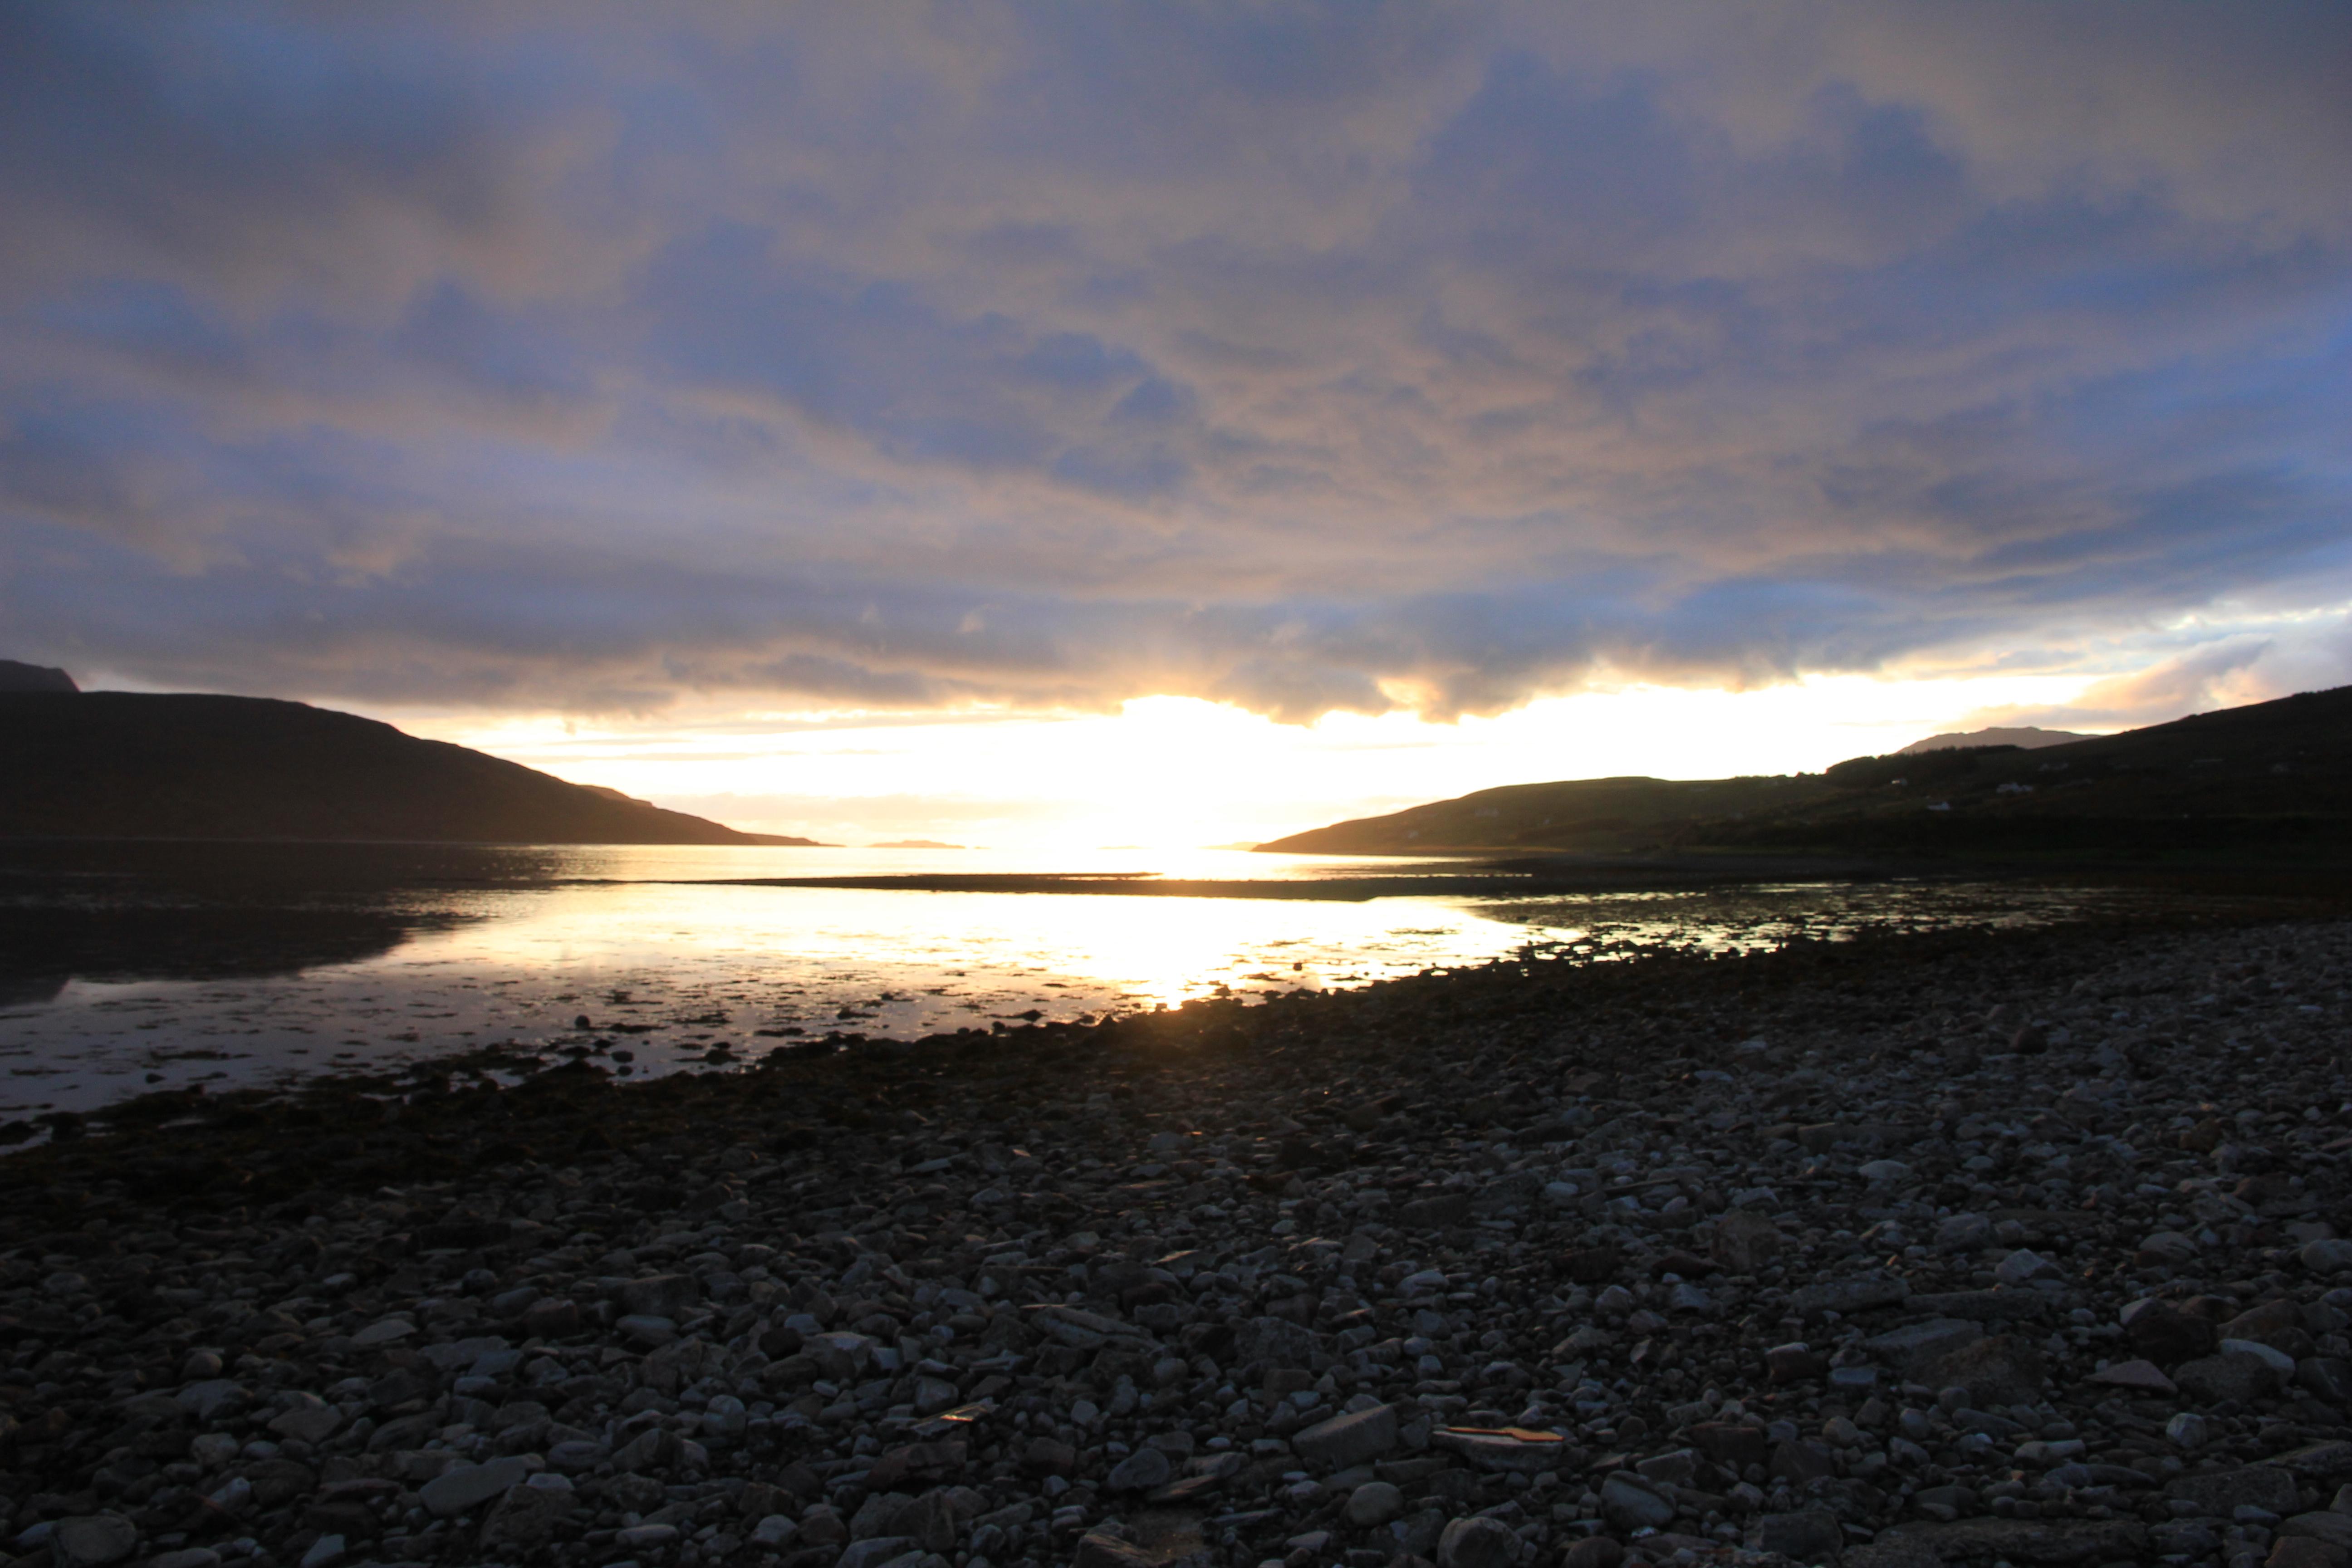 VW T5 T6 California Schottland Roadtrip 2015 Abendstimmung Meer Wolkenspiel Ullapool